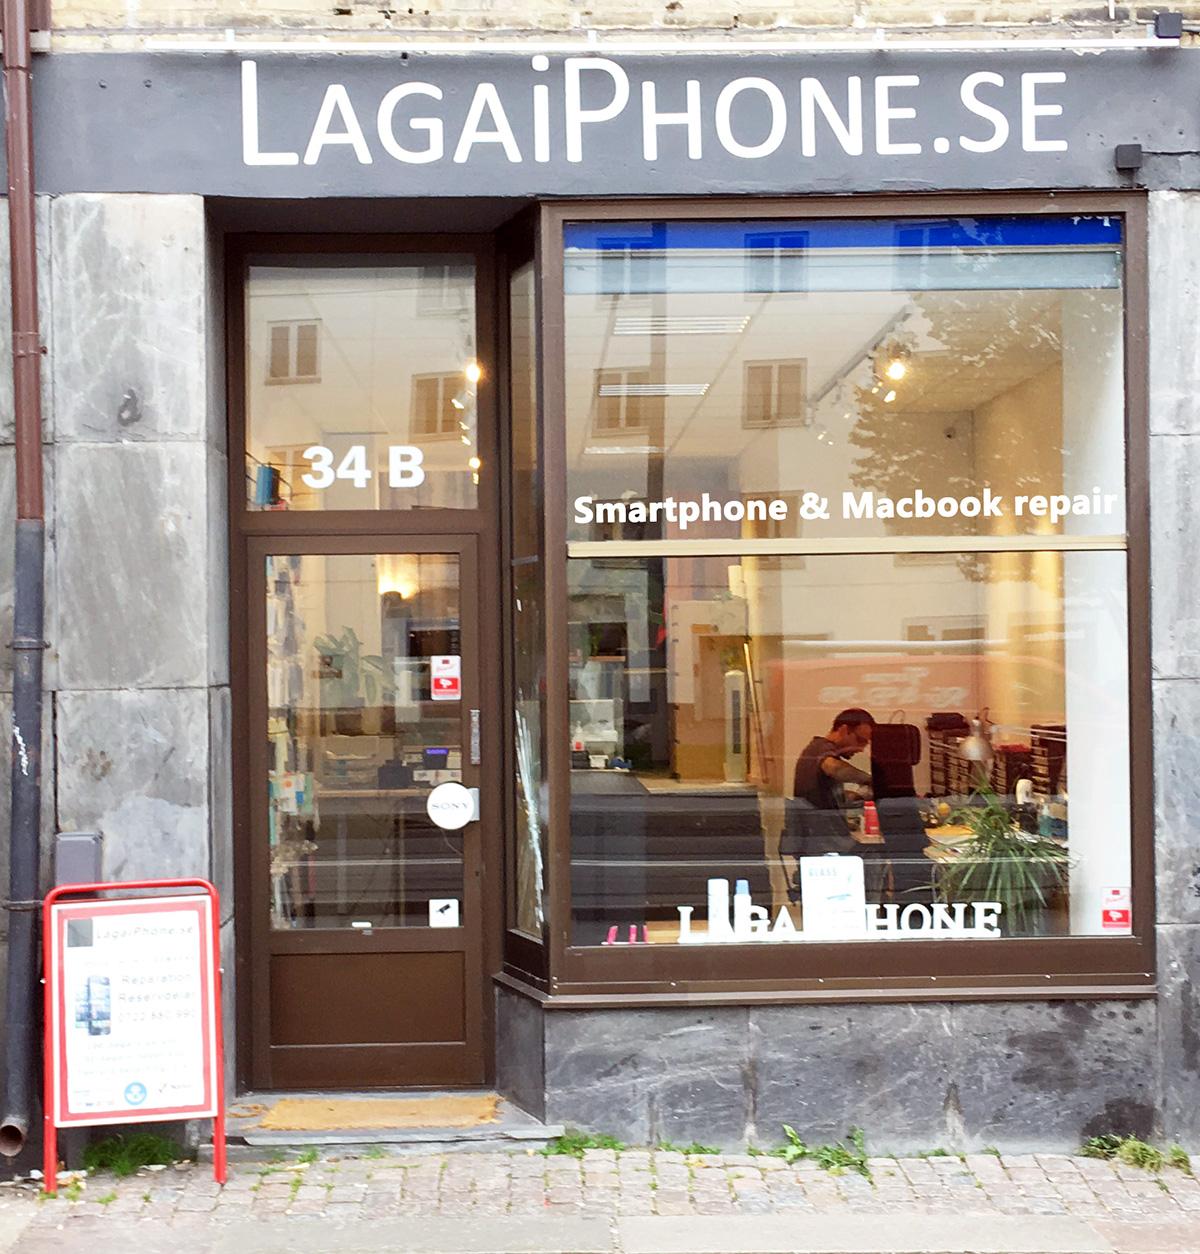 www.LagaiPhone.se